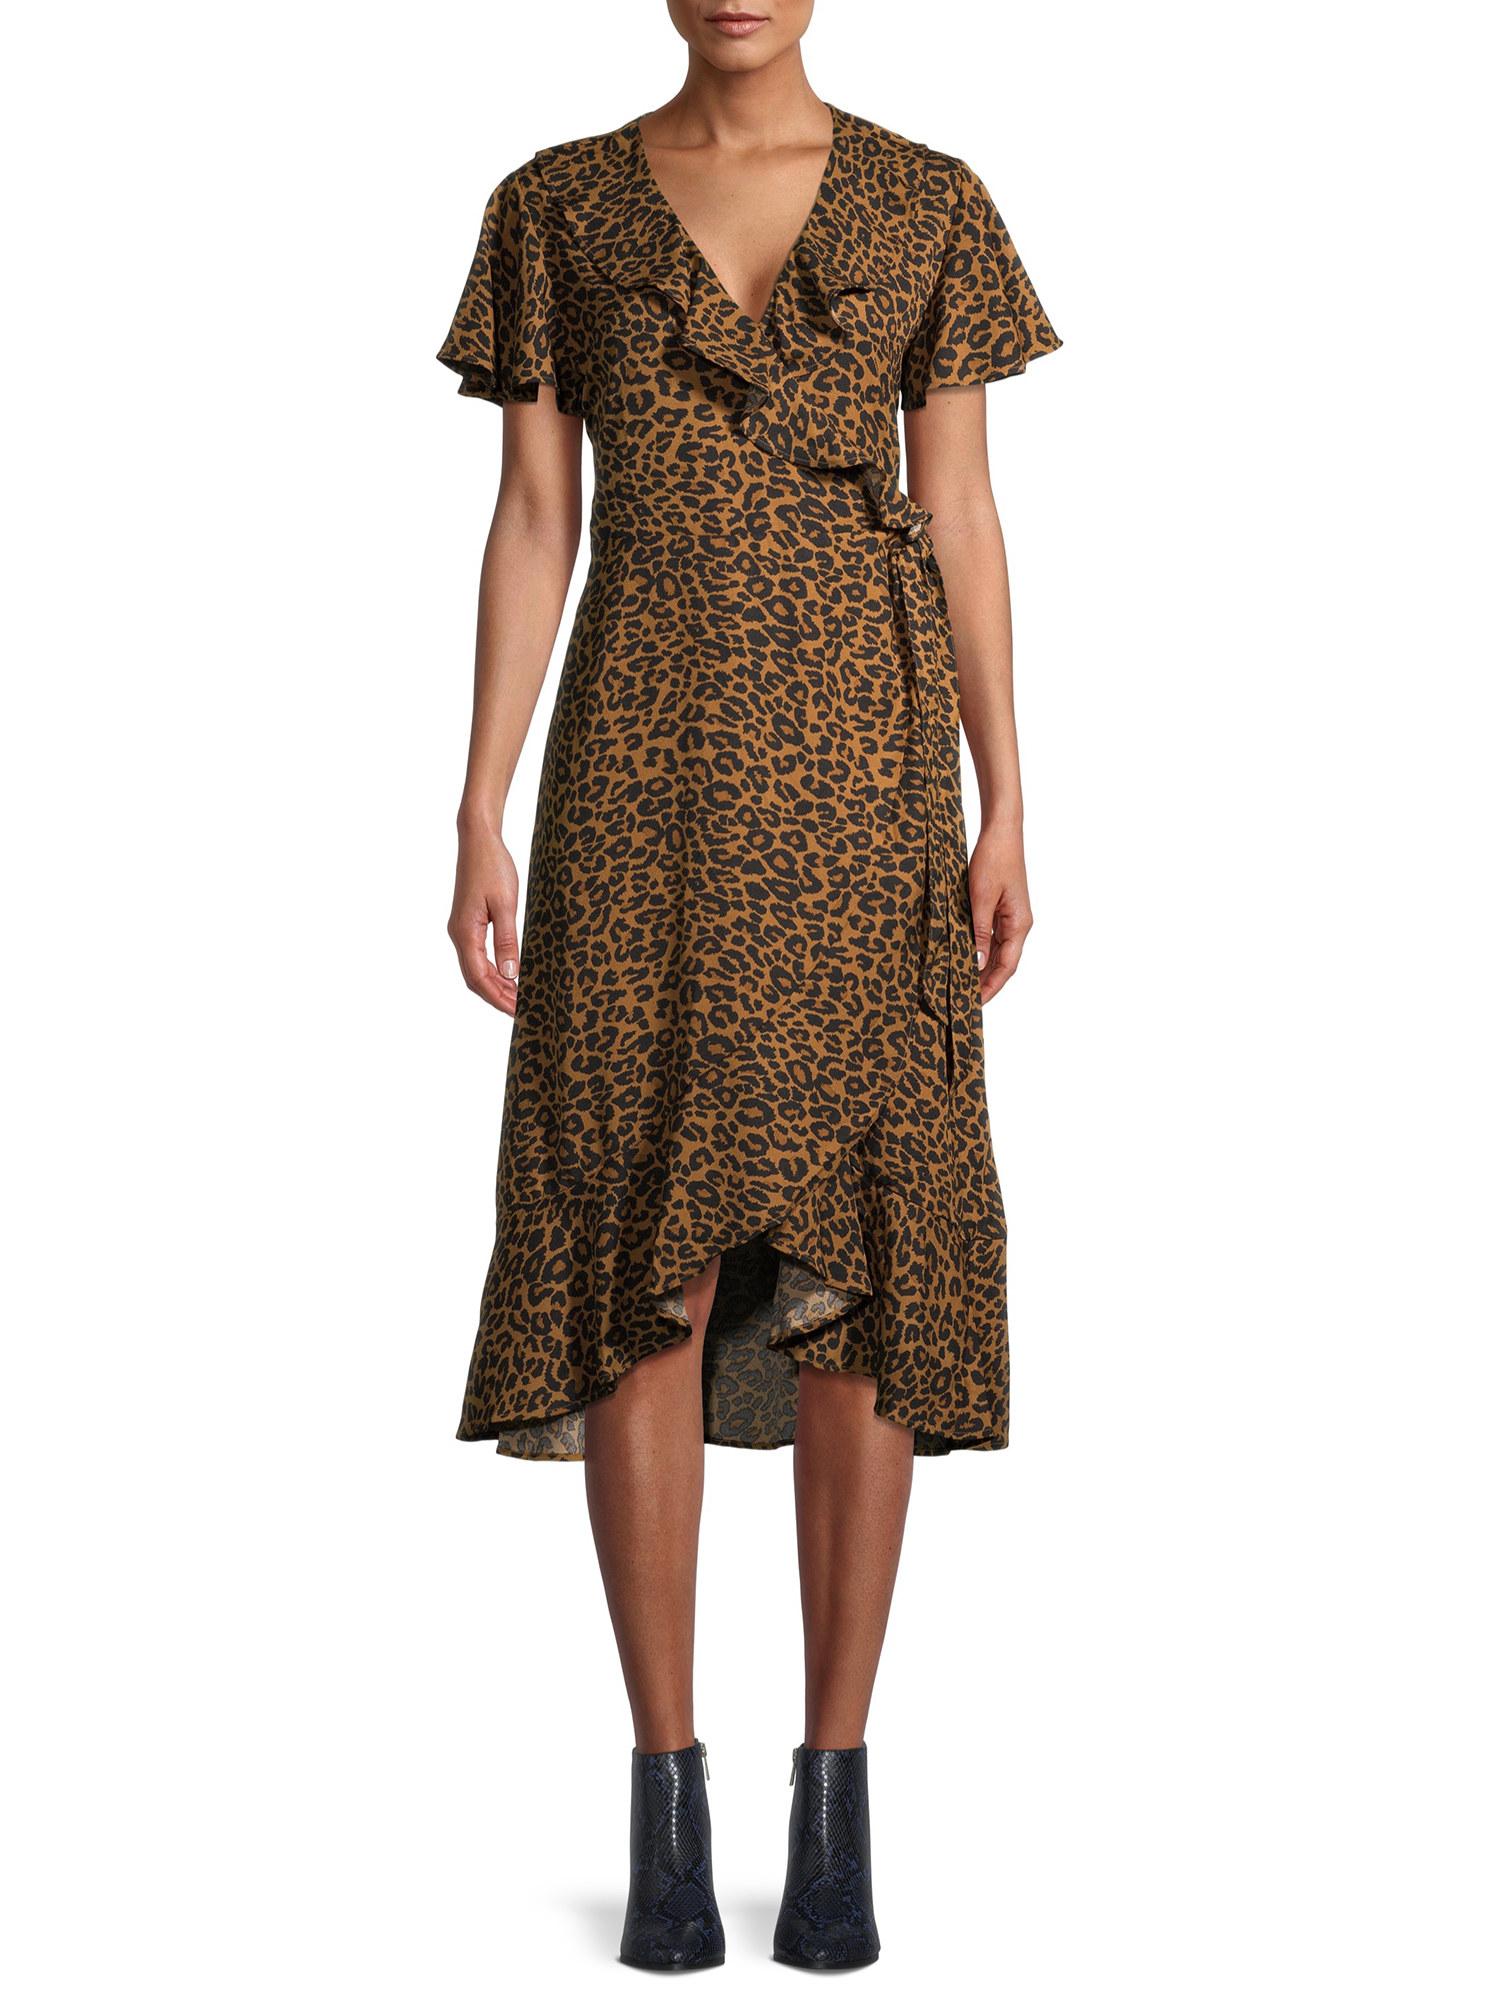 Model wearing animal print dress